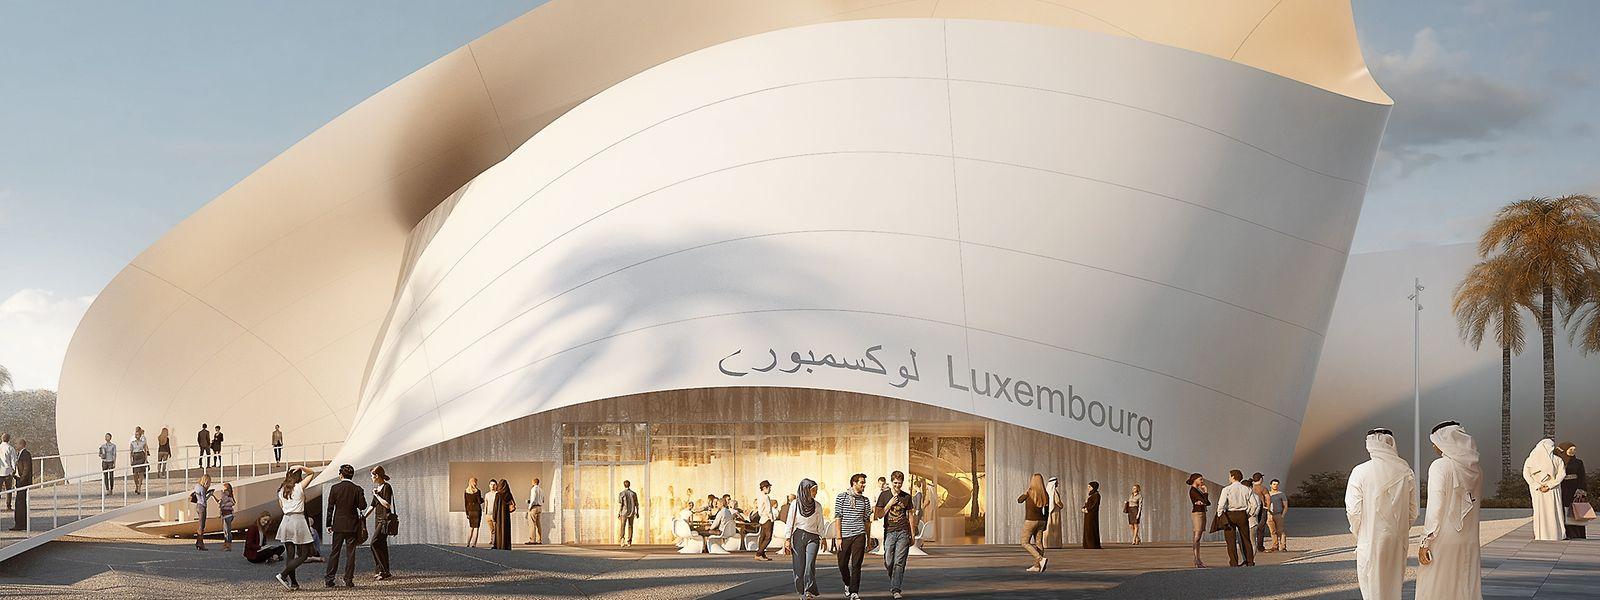 So soll der Luxemburger Pavillon bei der Weltausstellung in Dubai aussehen.